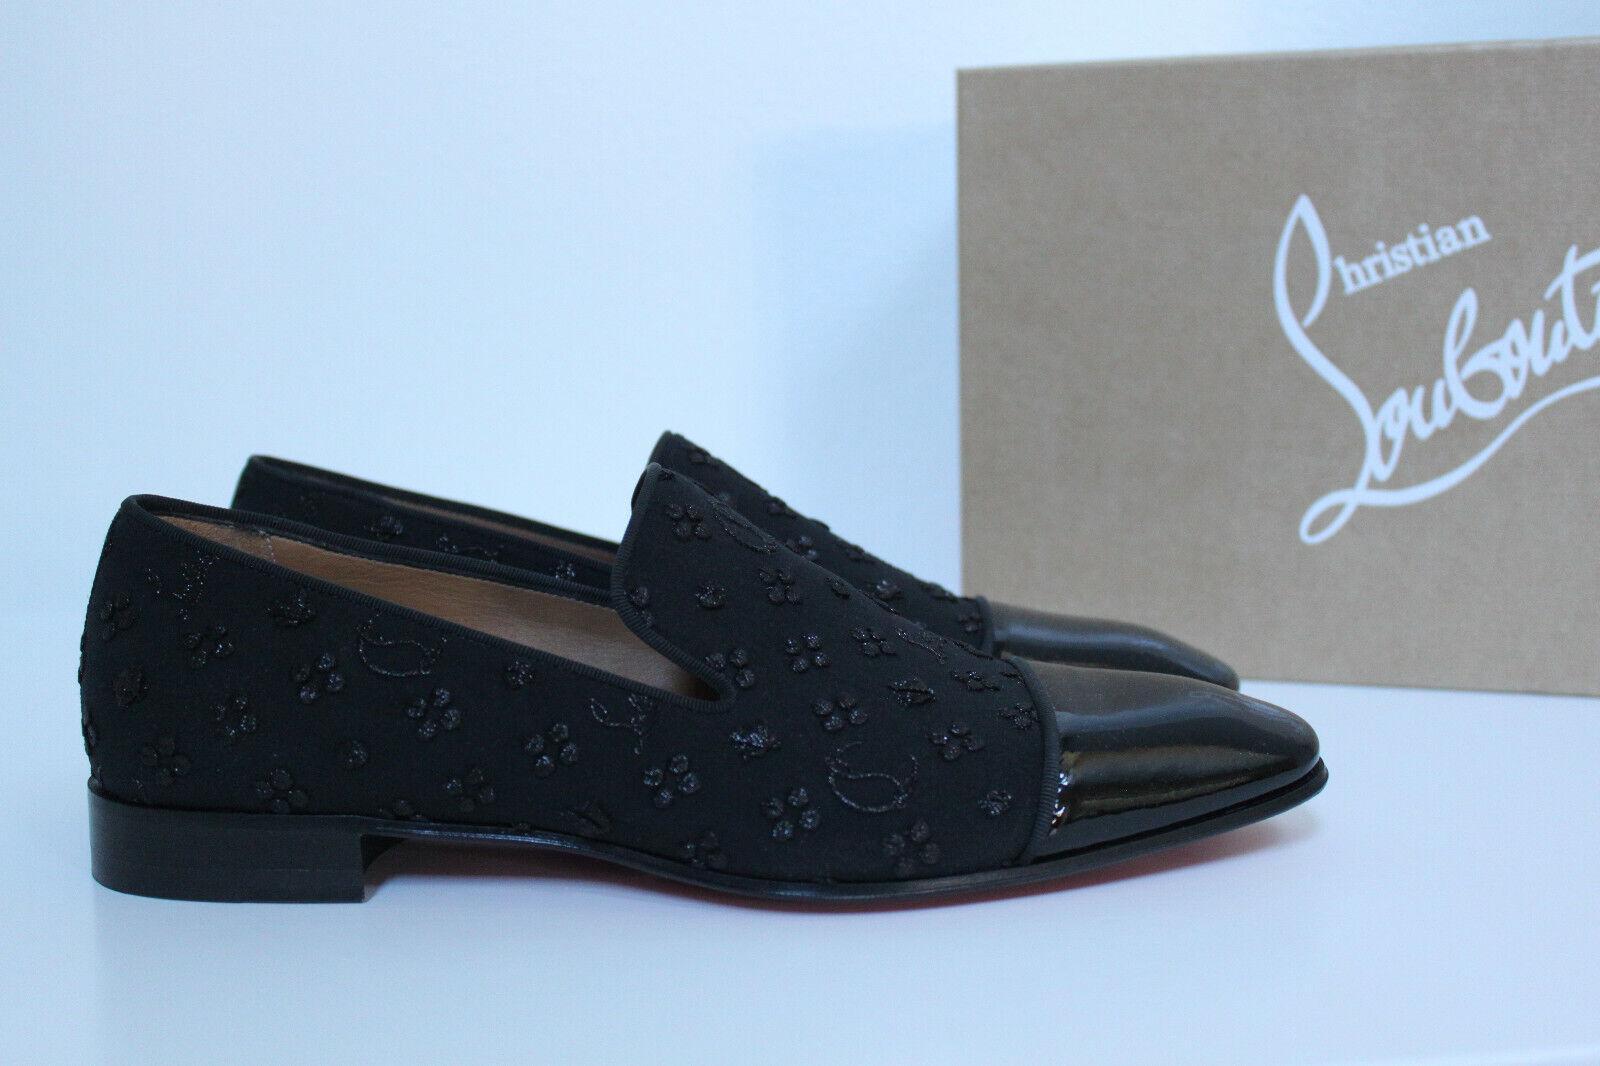 50289dd0aa29 Sz 8 US 41 Christian Louboutin Dandelion Dandelion Dandelion Flat Black Cap  Toe Logo Oxford shoes ...